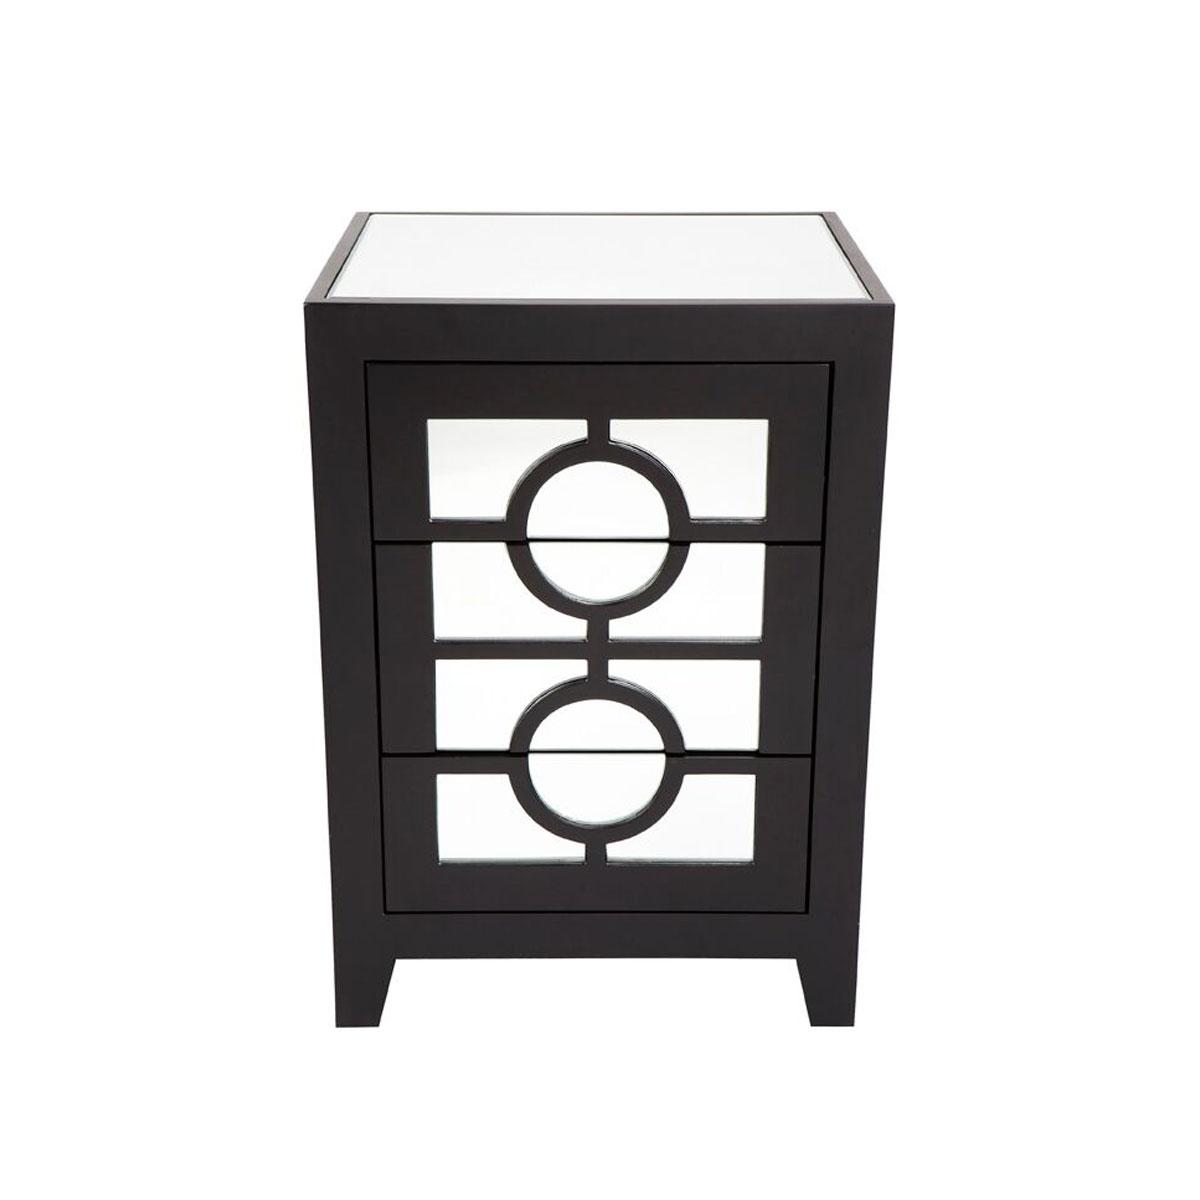 Stockton black mirrored bedside table 46cm x 40cm ebay stockton black mirrored bedside table 46cm x 40cm watchthetrailerfo